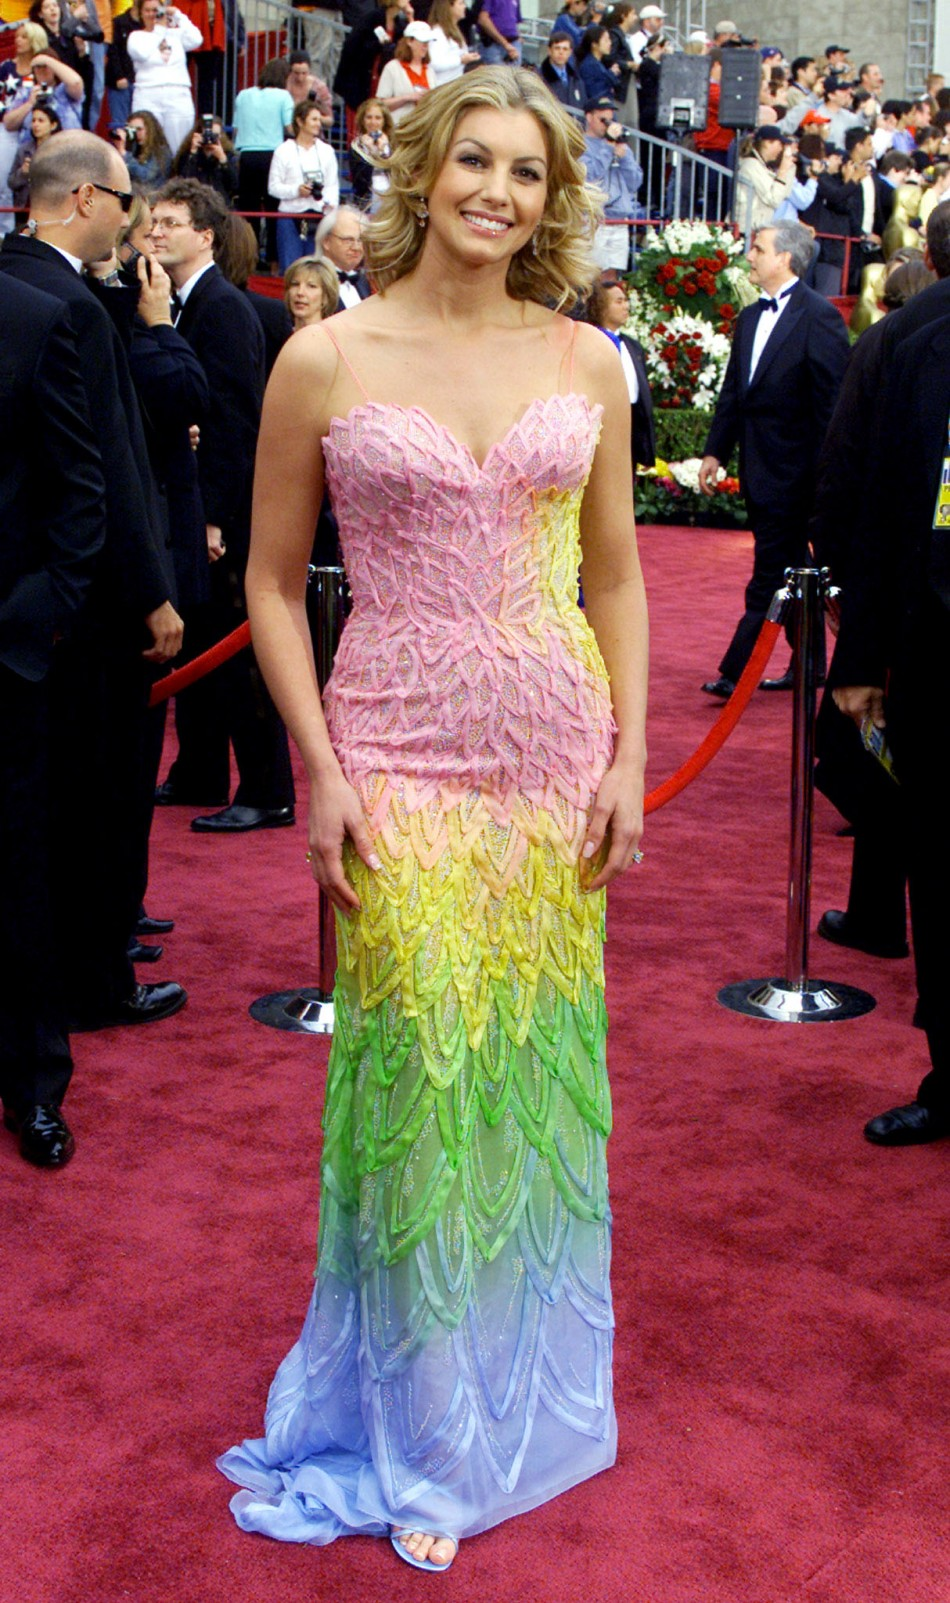 Oscars 2015 Worst And Weirdest Dresses Of All Time On The